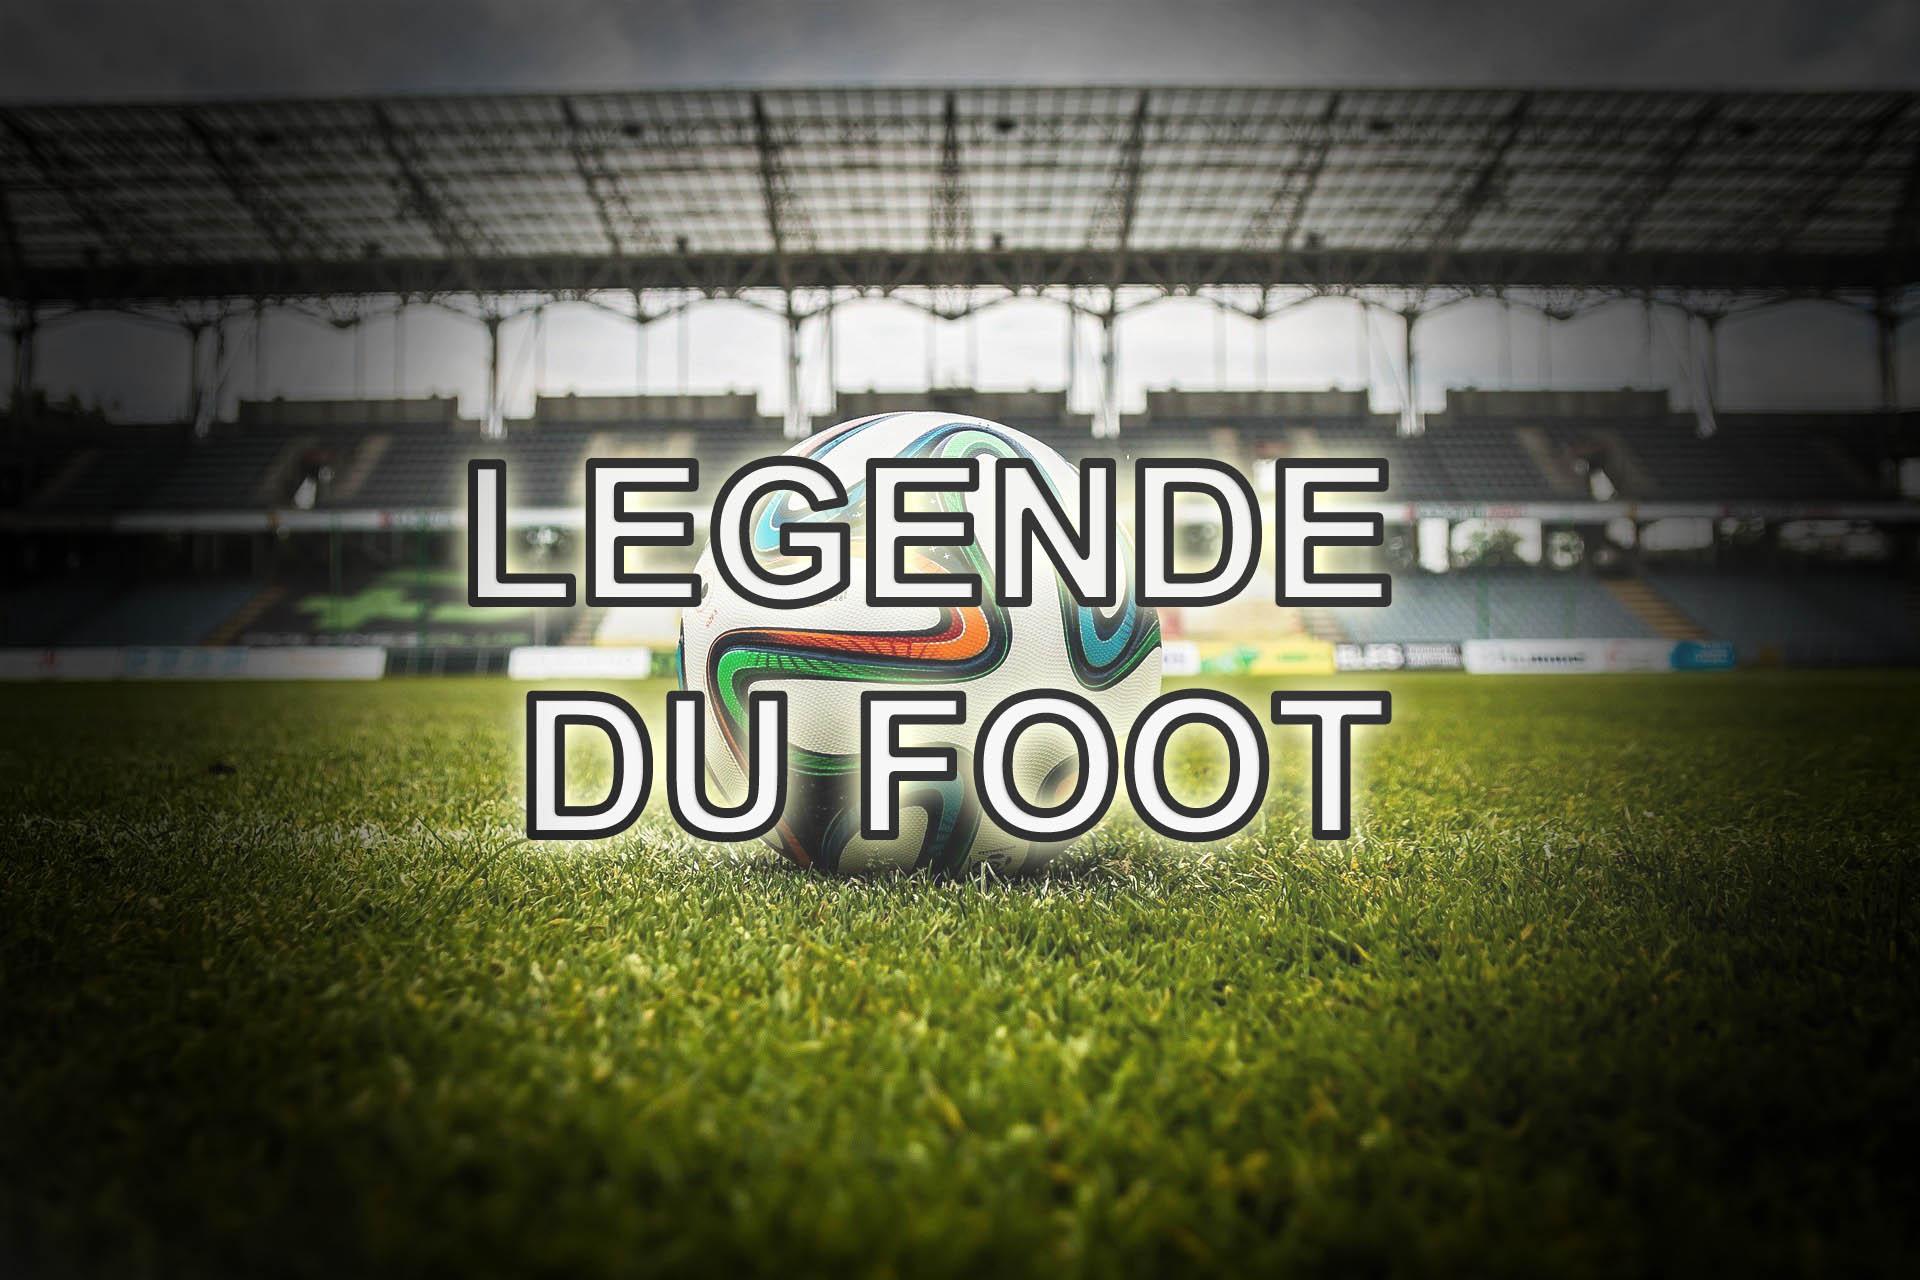 fond ecran legende du foot